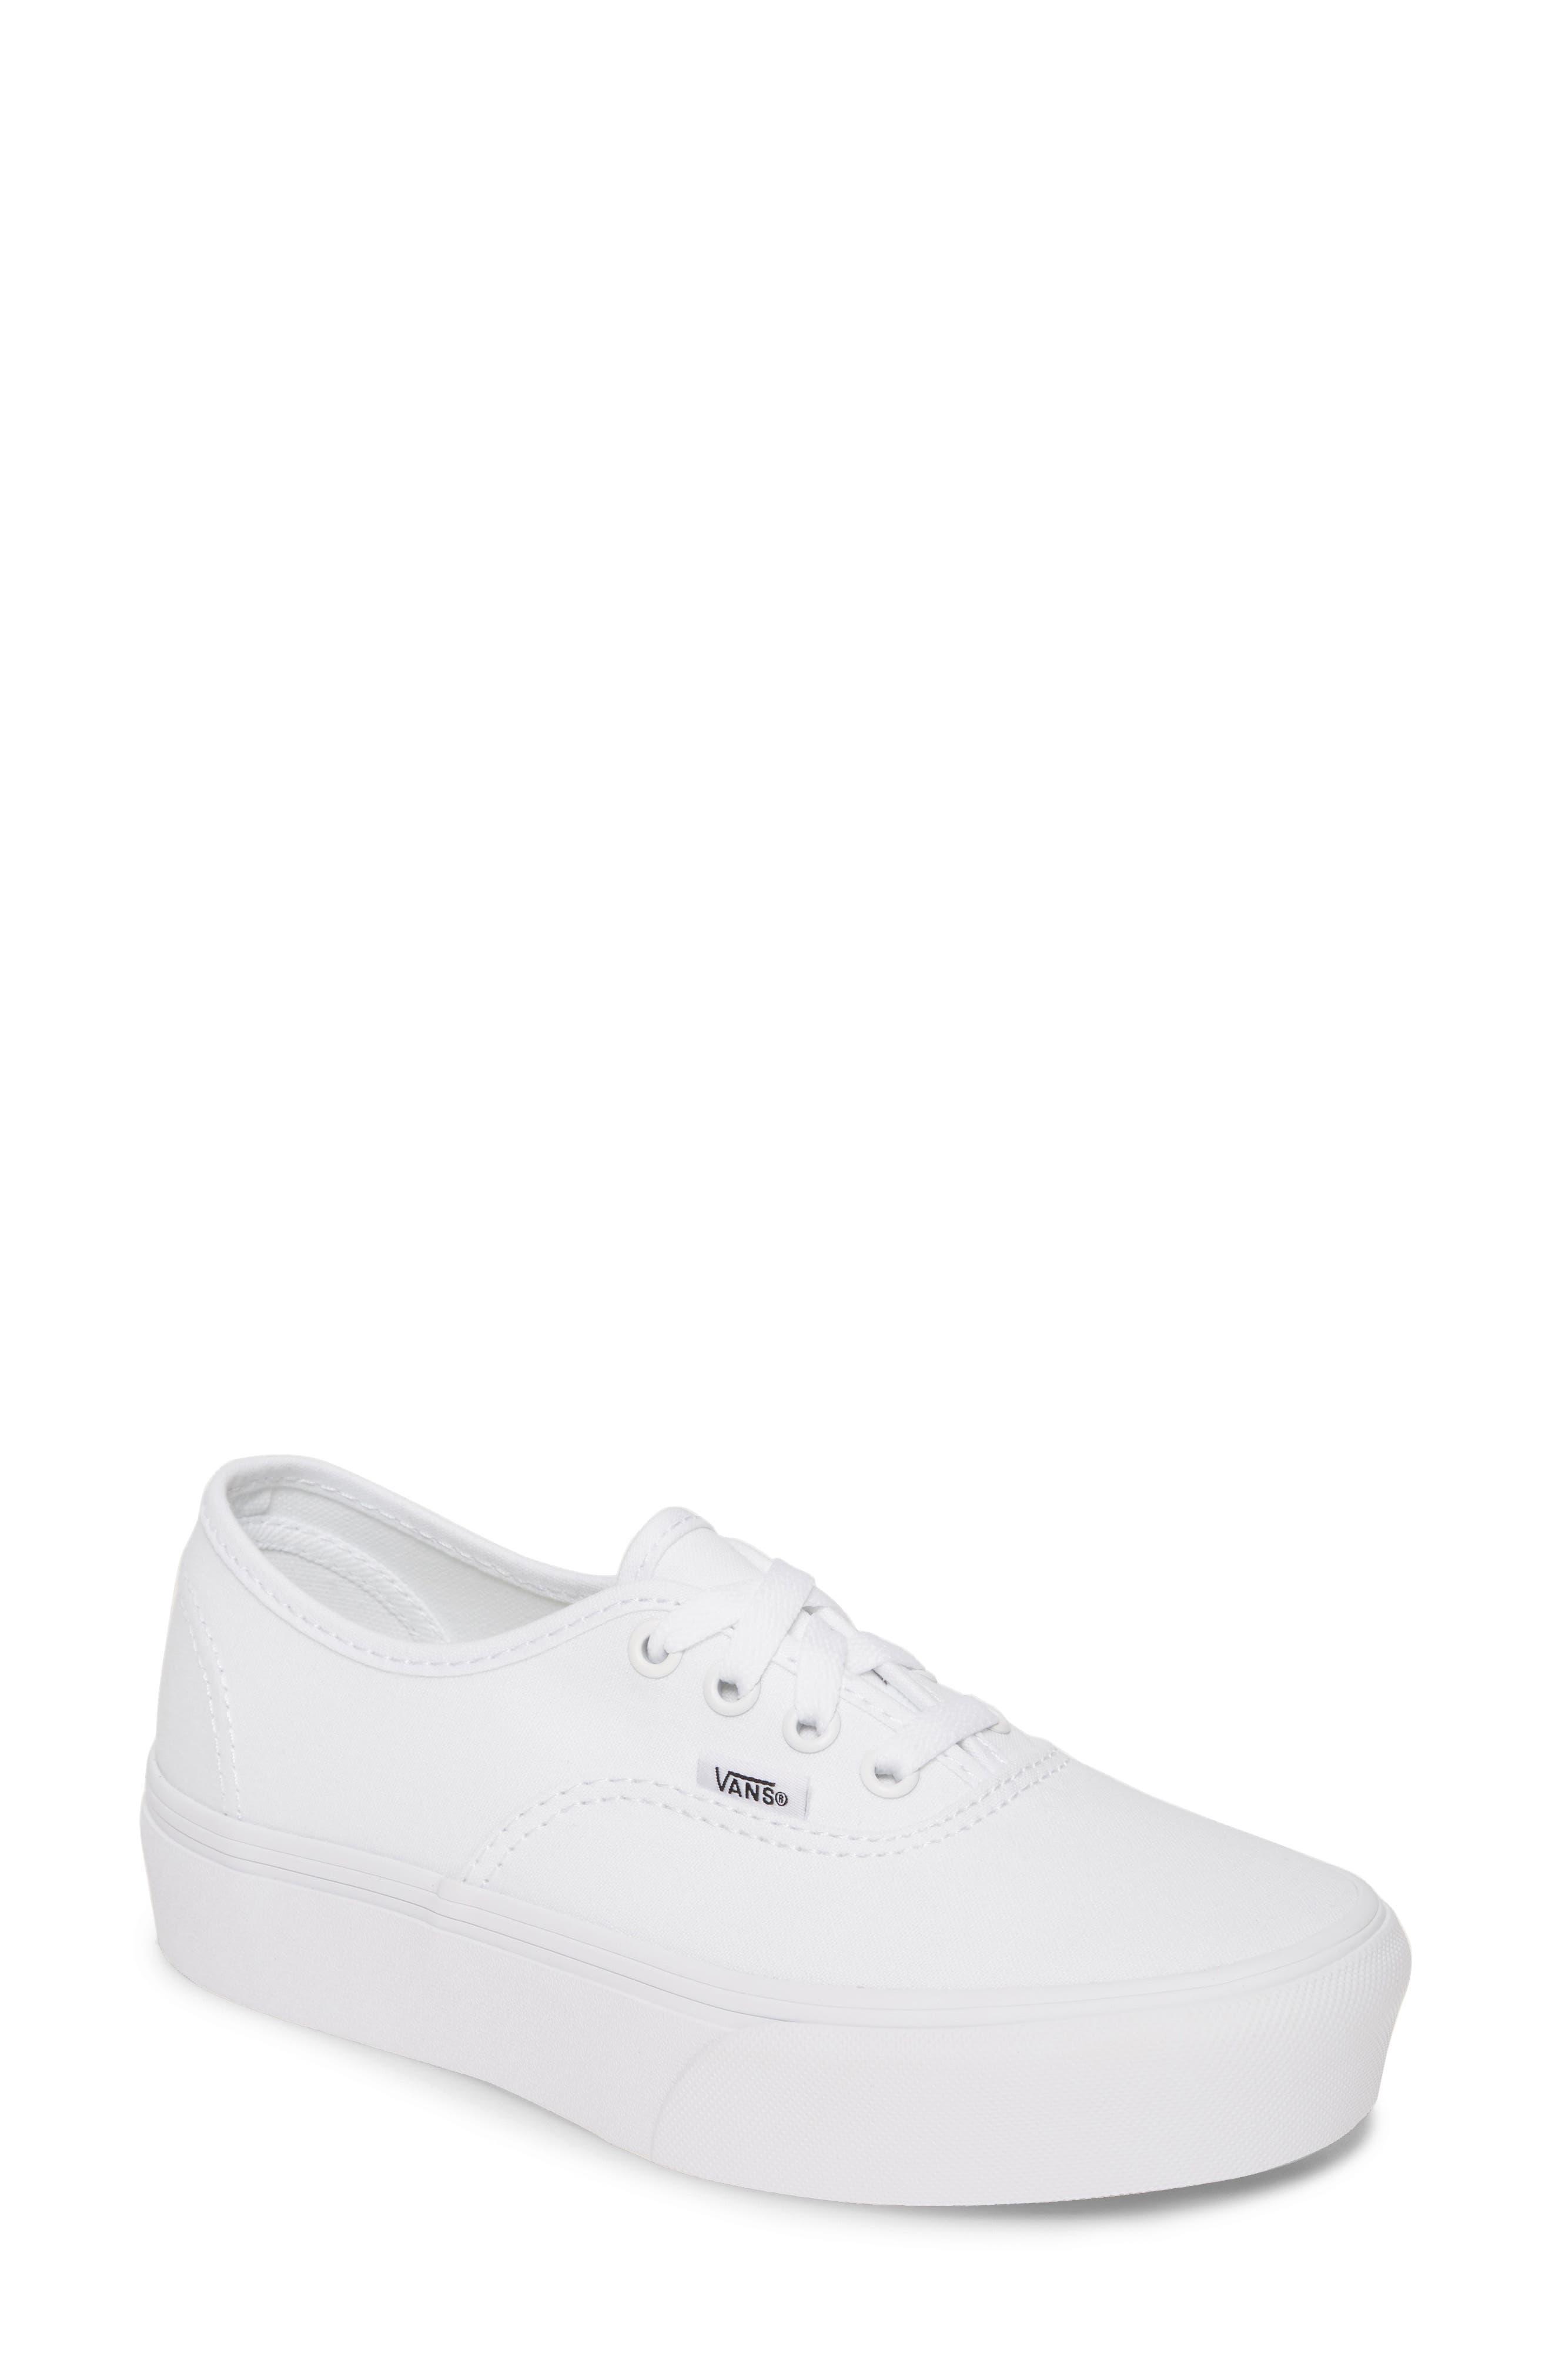 vans white platform sneakers Achat | serrurier